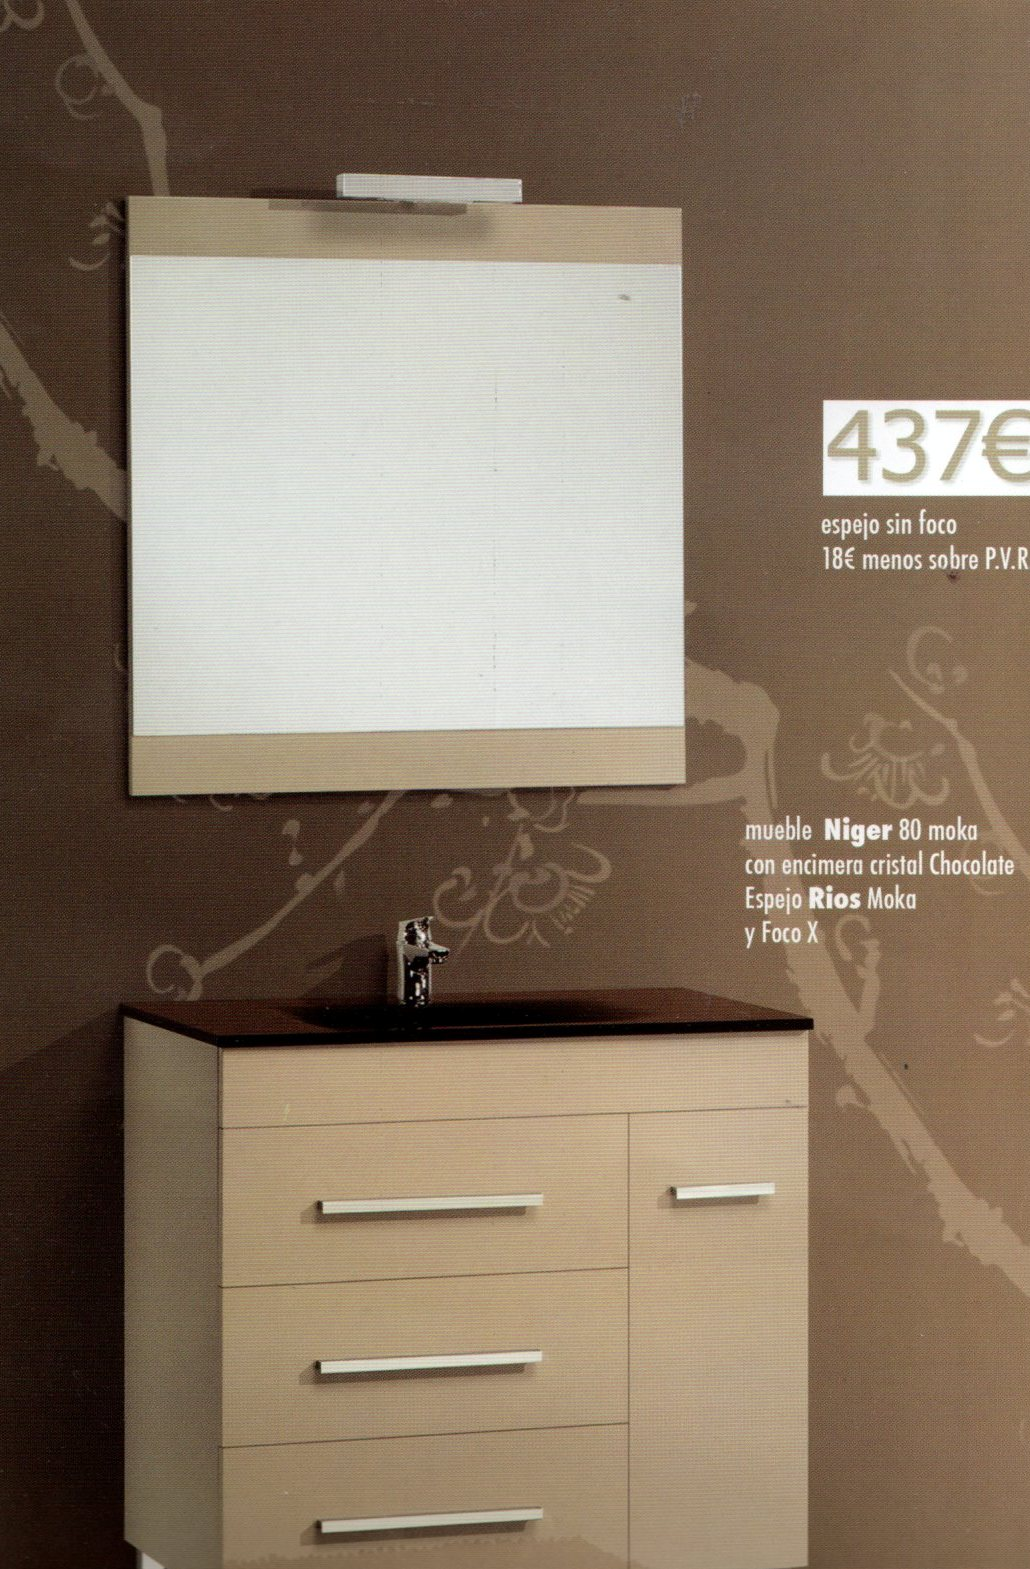 Maringlass aluminio vidrio muebles de ba o super ofertas - Ofertas en muebles de bano ...